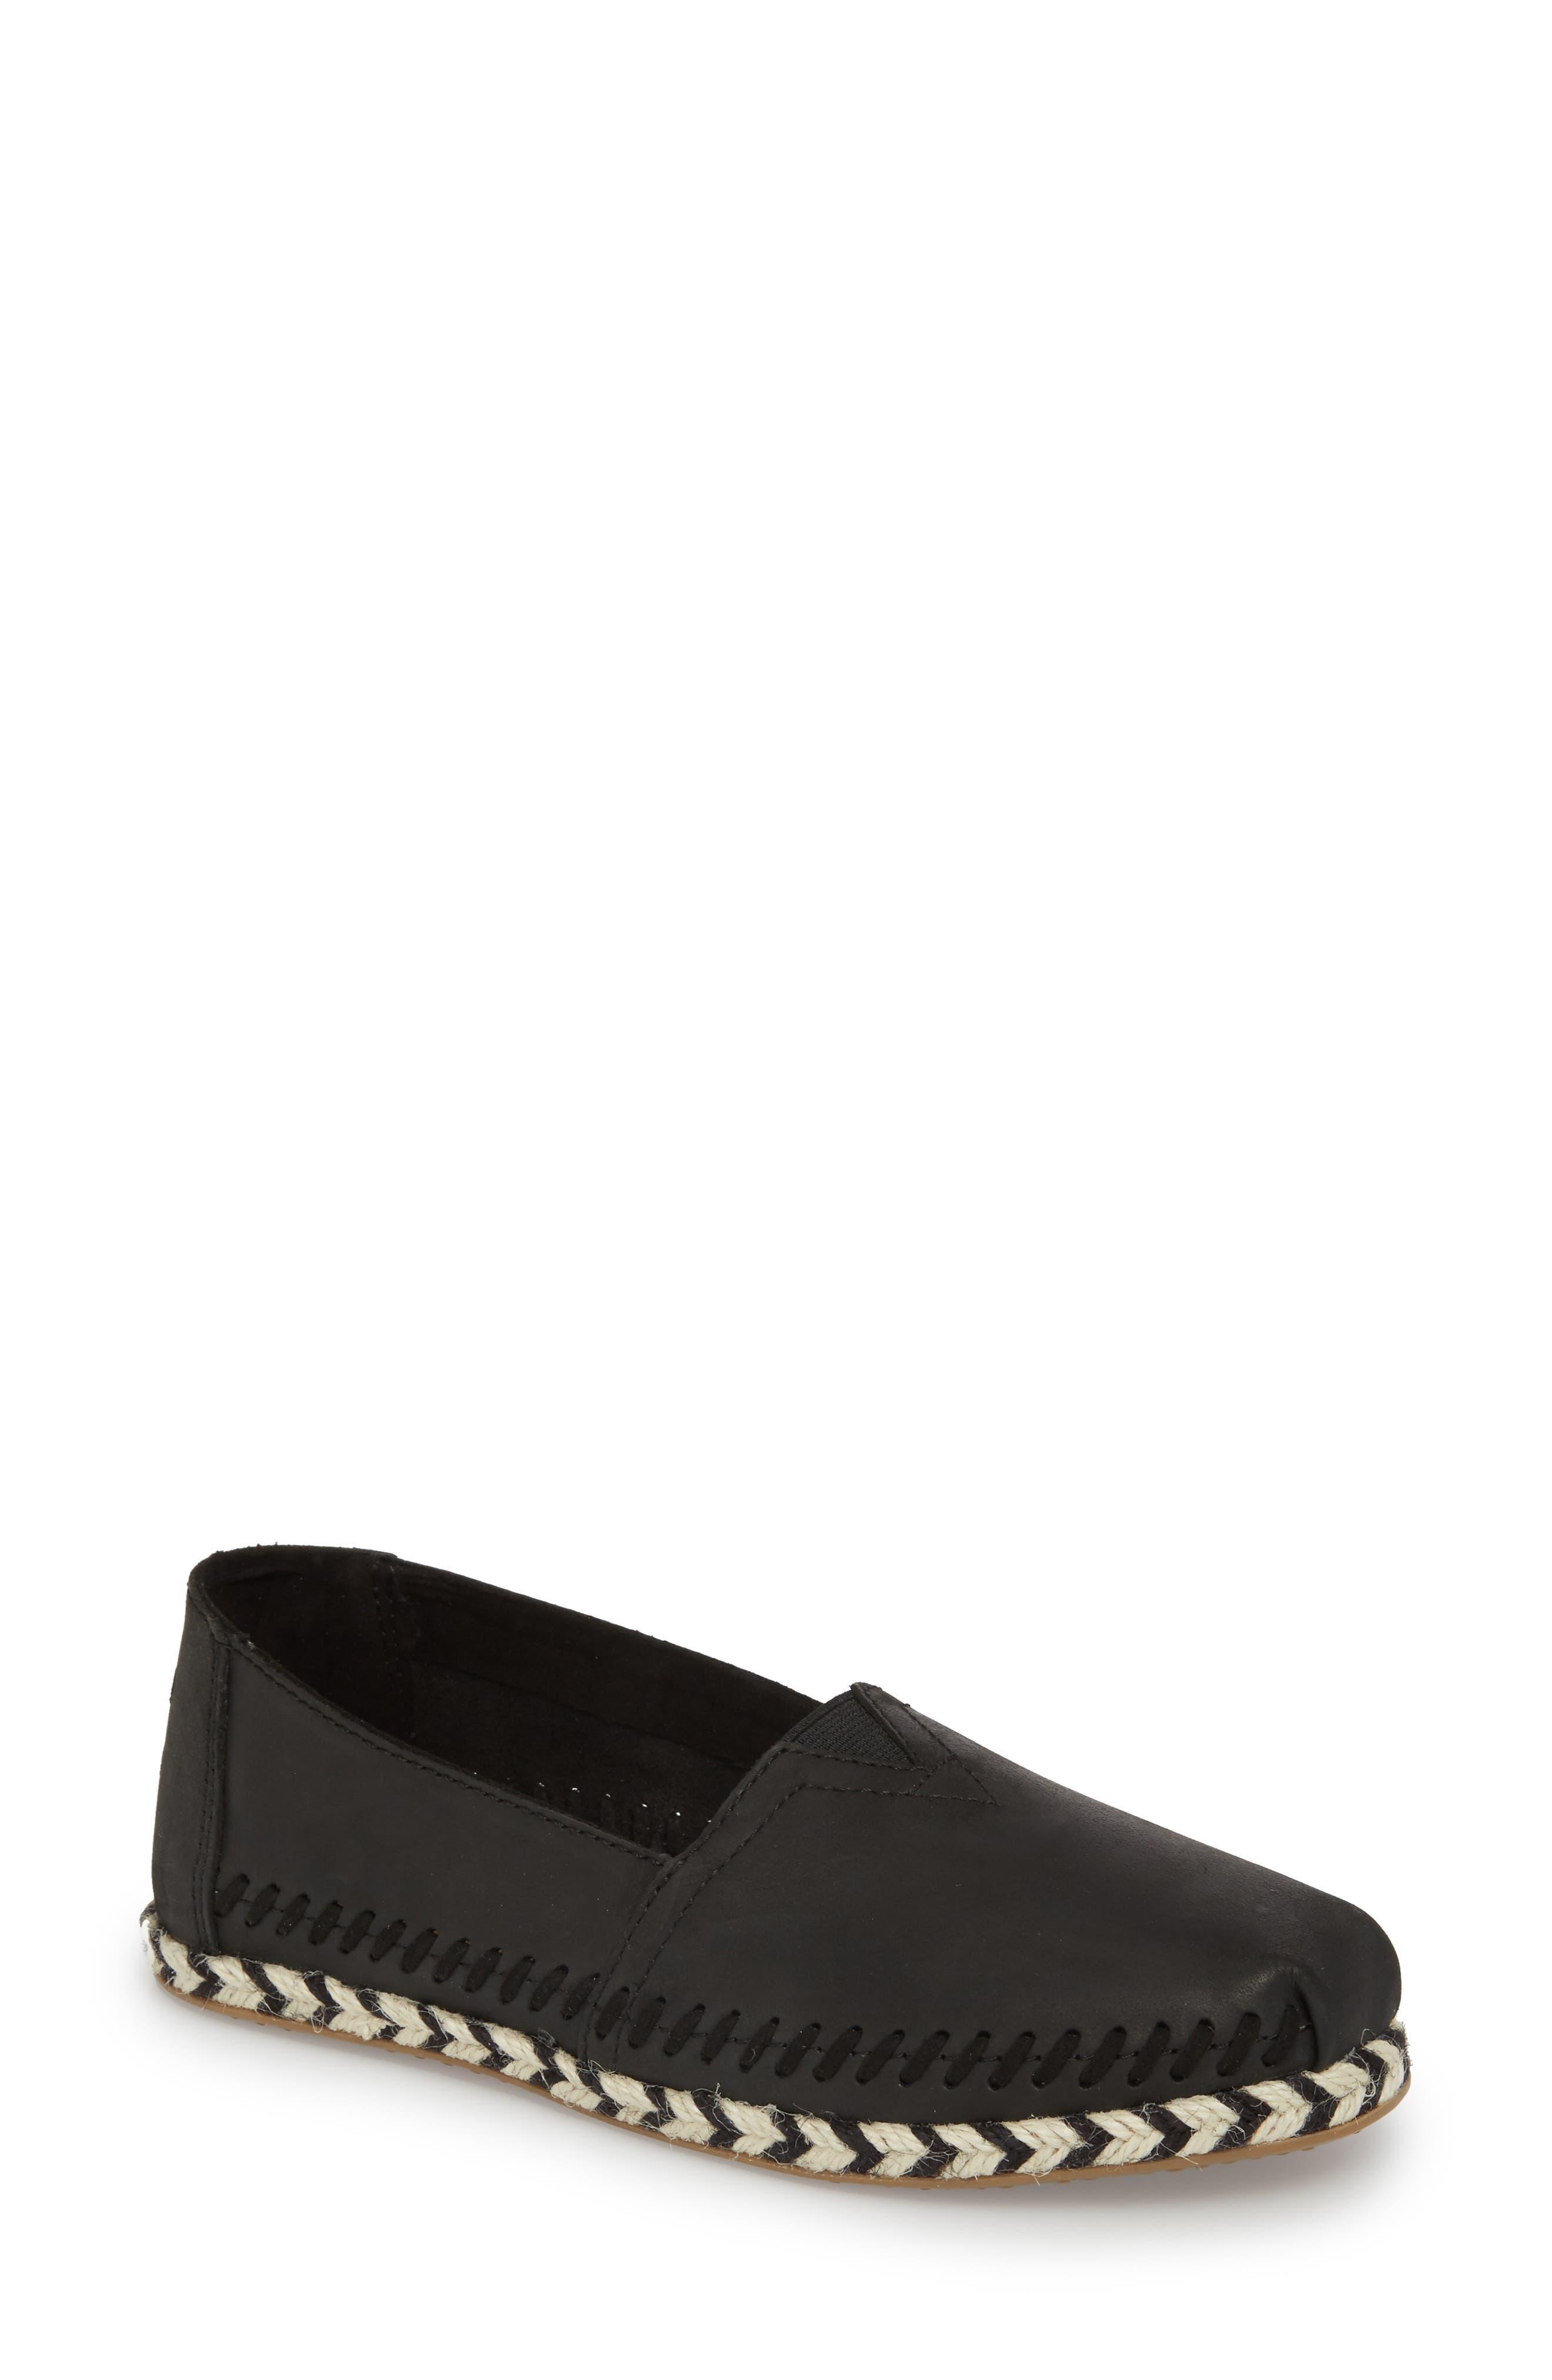 Alpargata Slip-On,                         Main,                         color, Black Leather Rope Sole